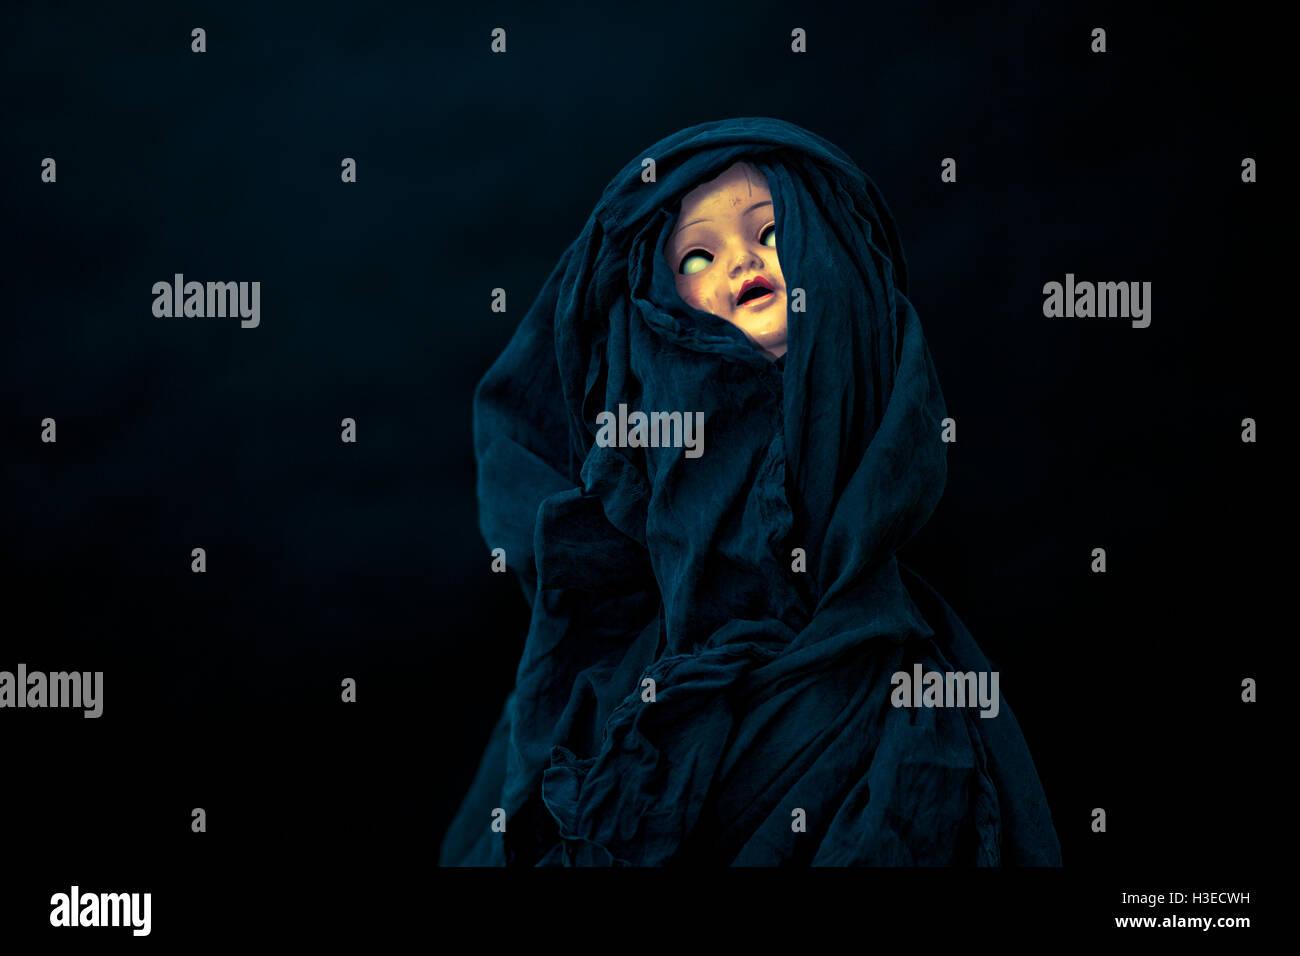 Creepy doll - Stock Image